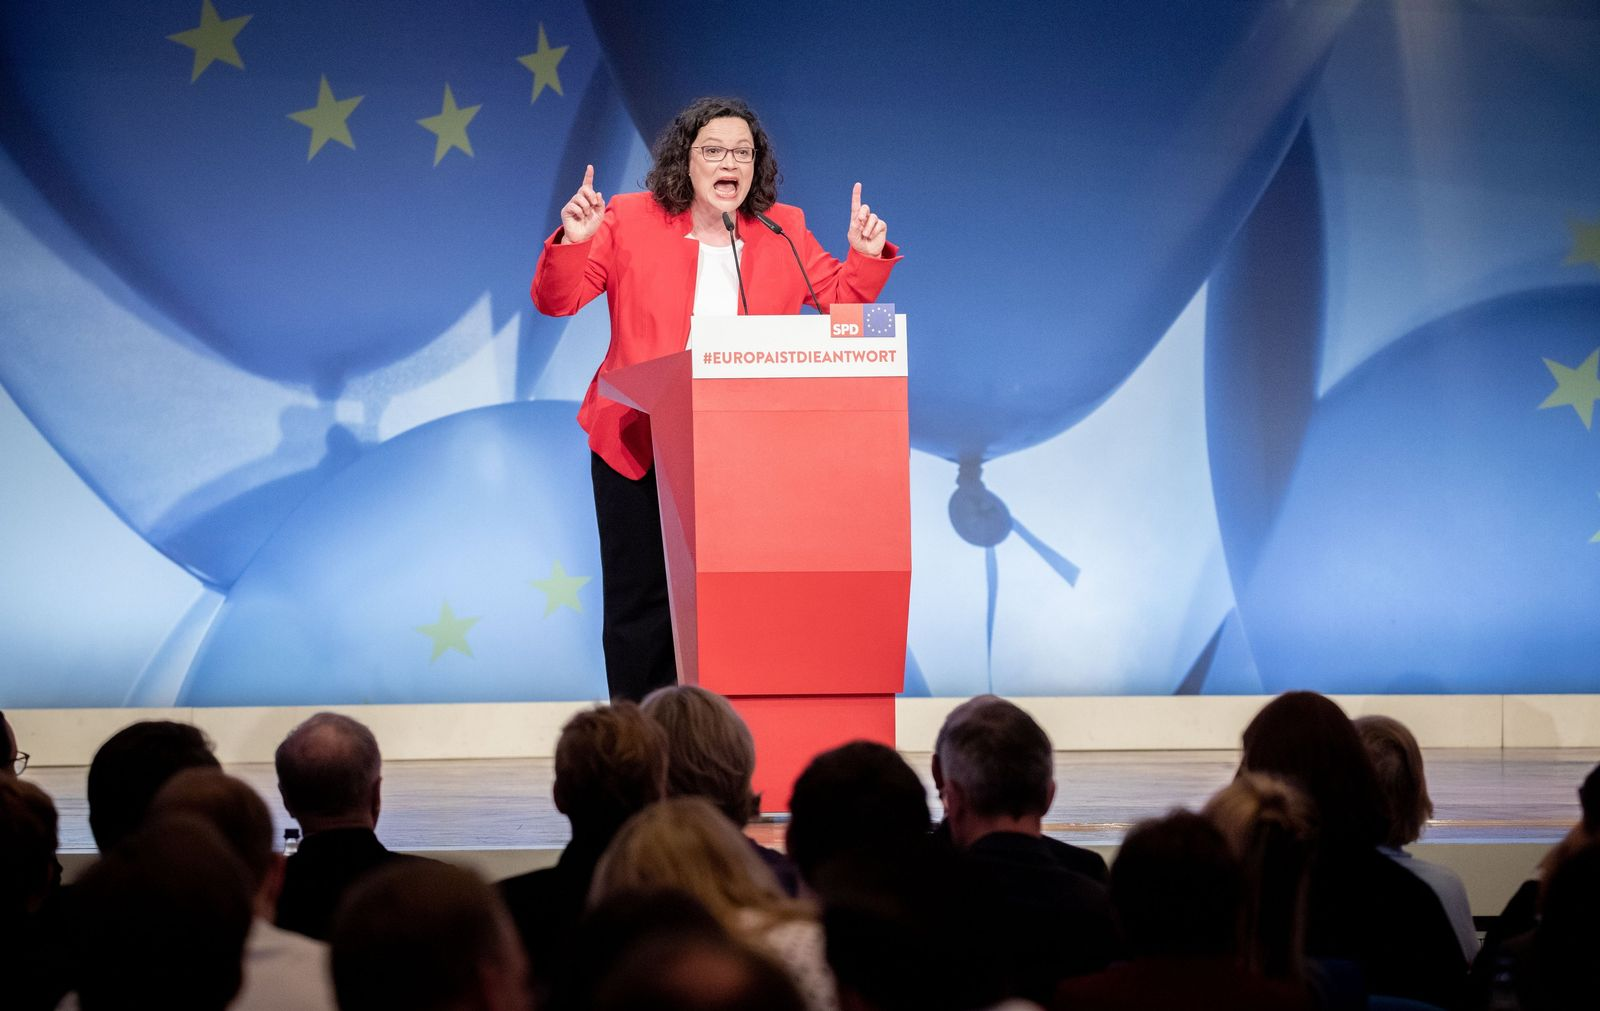 Andrea Nahles/ Europakonvent der SPD